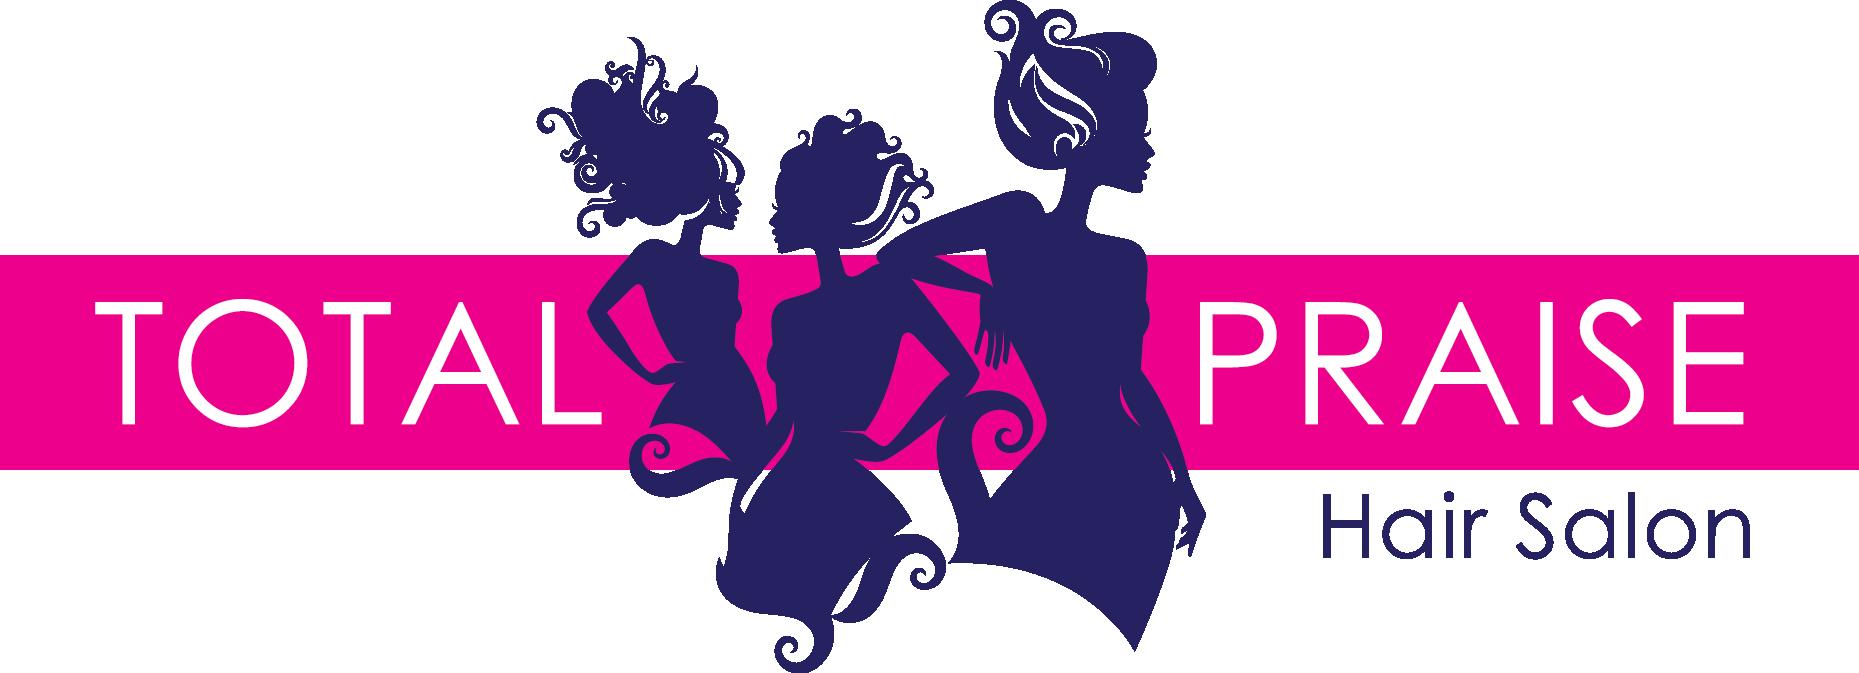 Cosmetology clipart beauty shop. Total praise salon logo